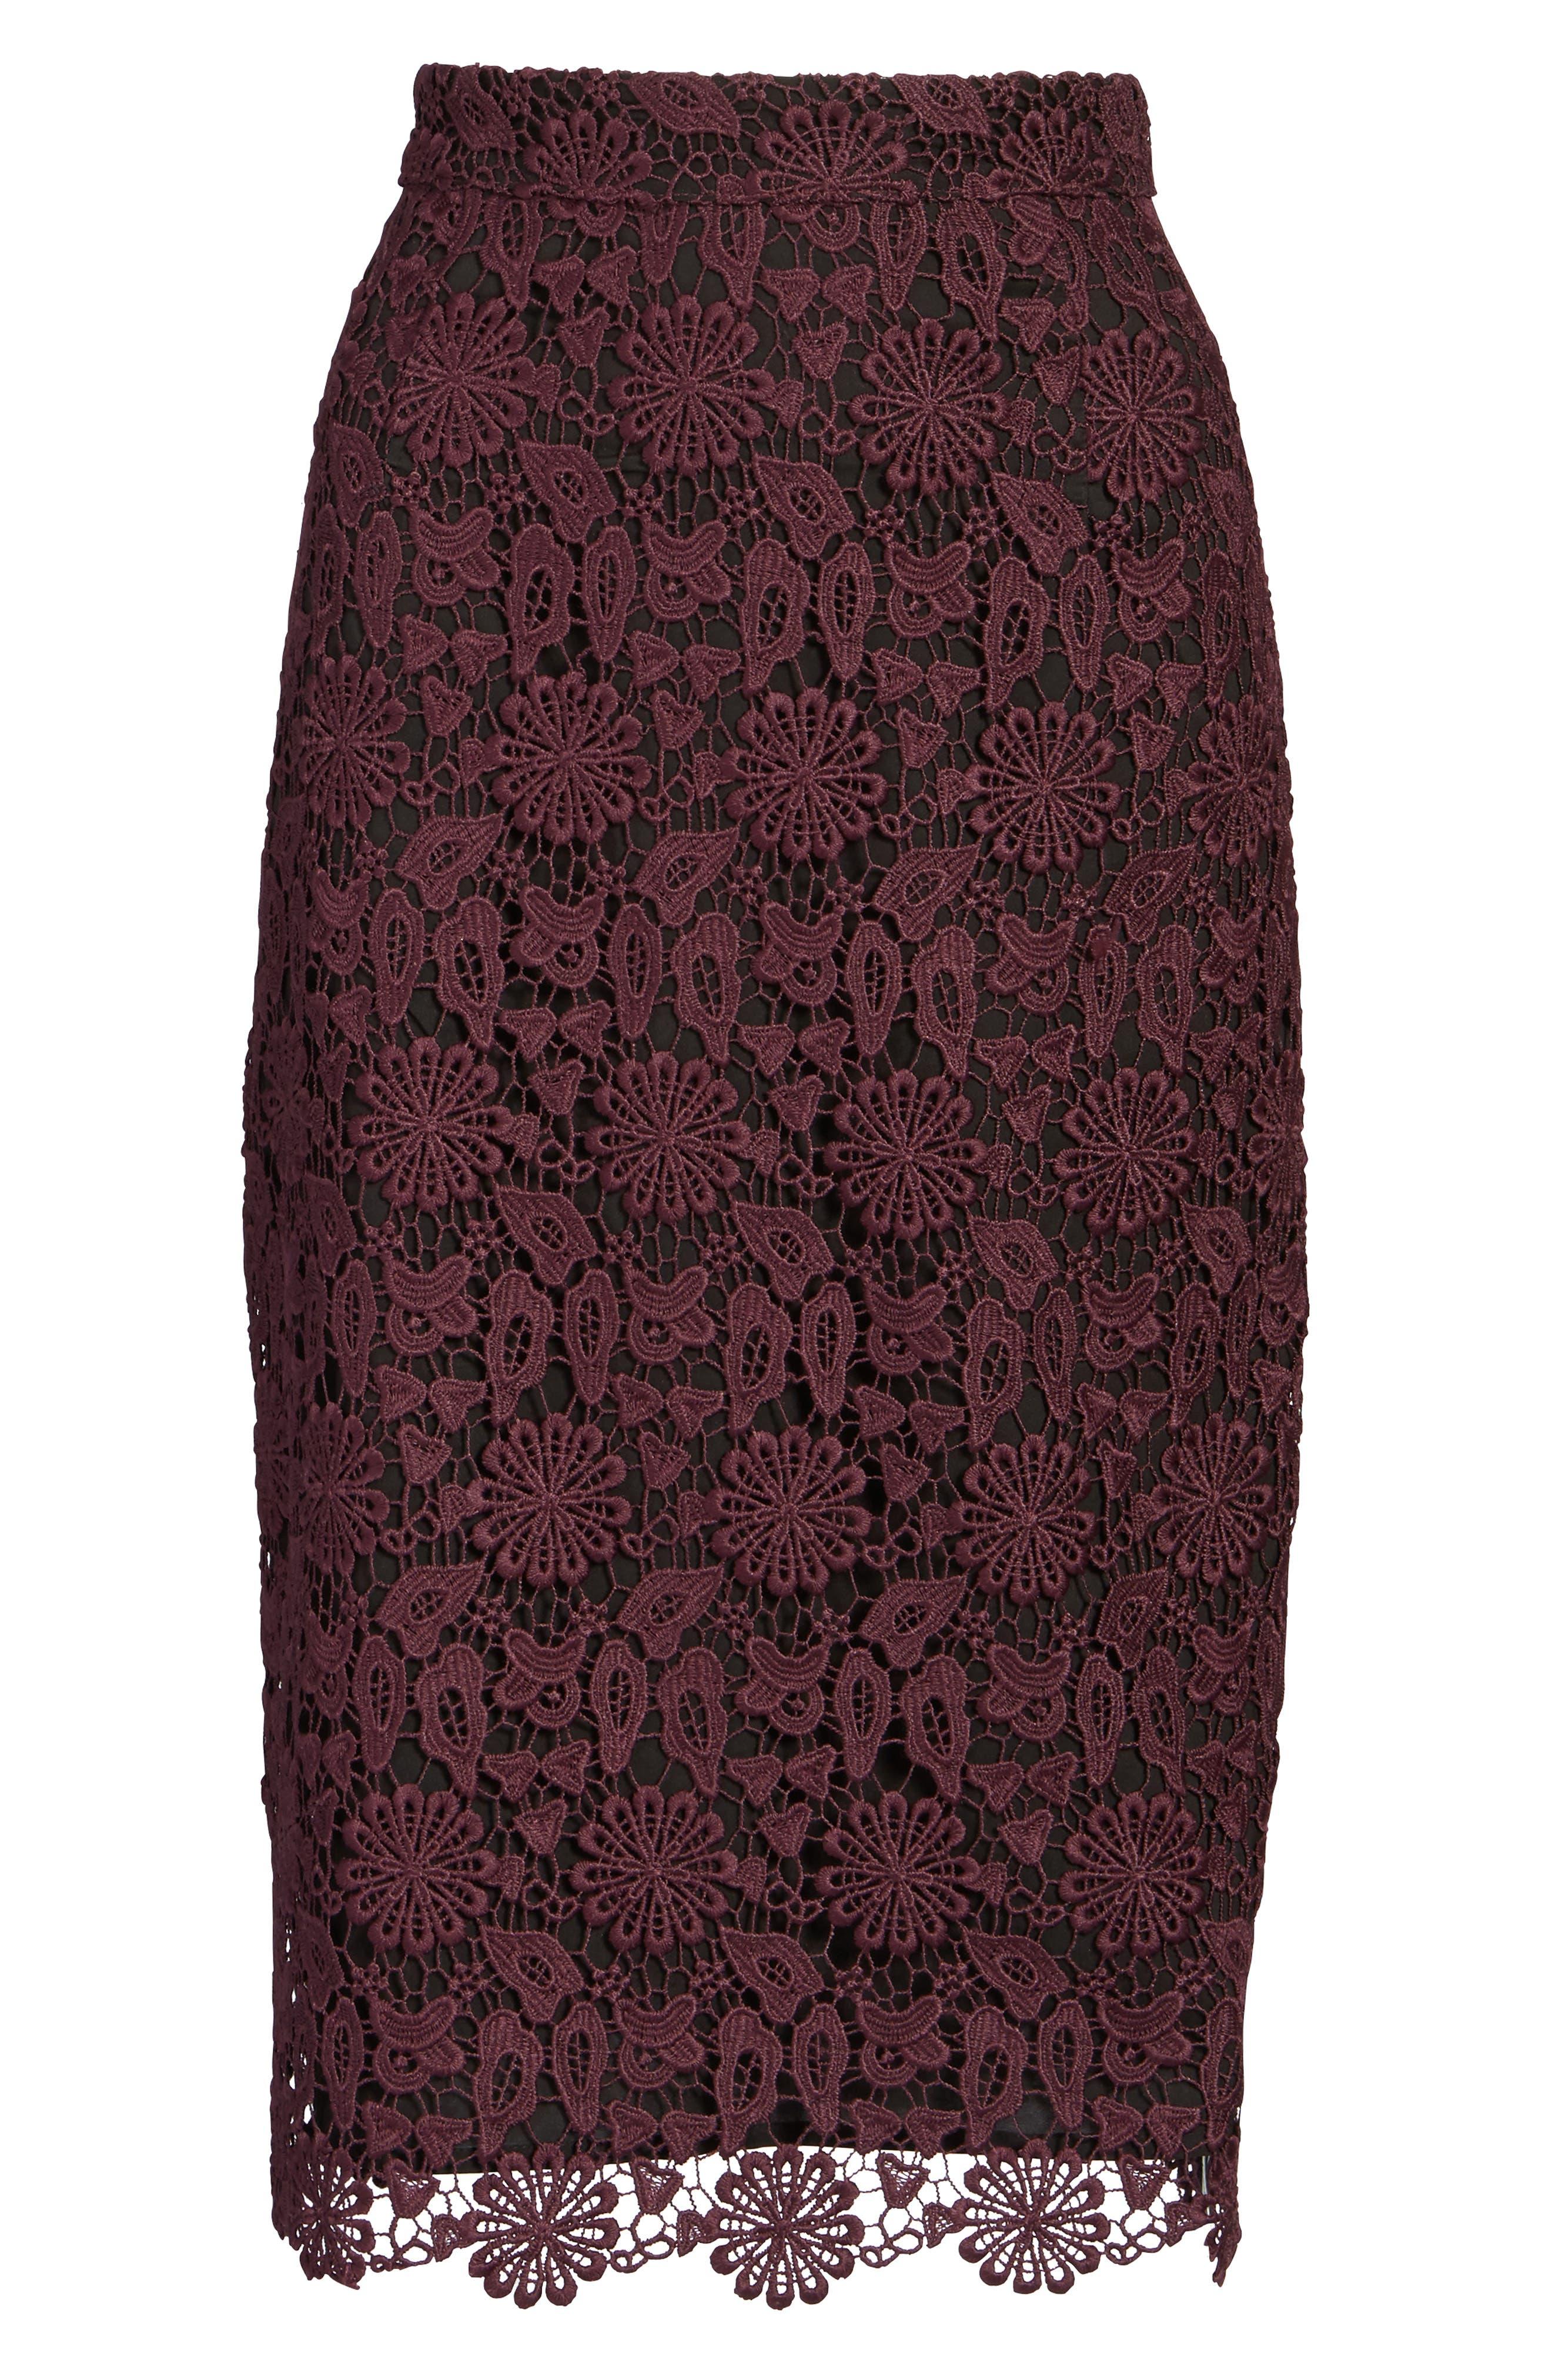 Lace Pencil Skirt,                             Alternate thumbnail 6, color,                             930